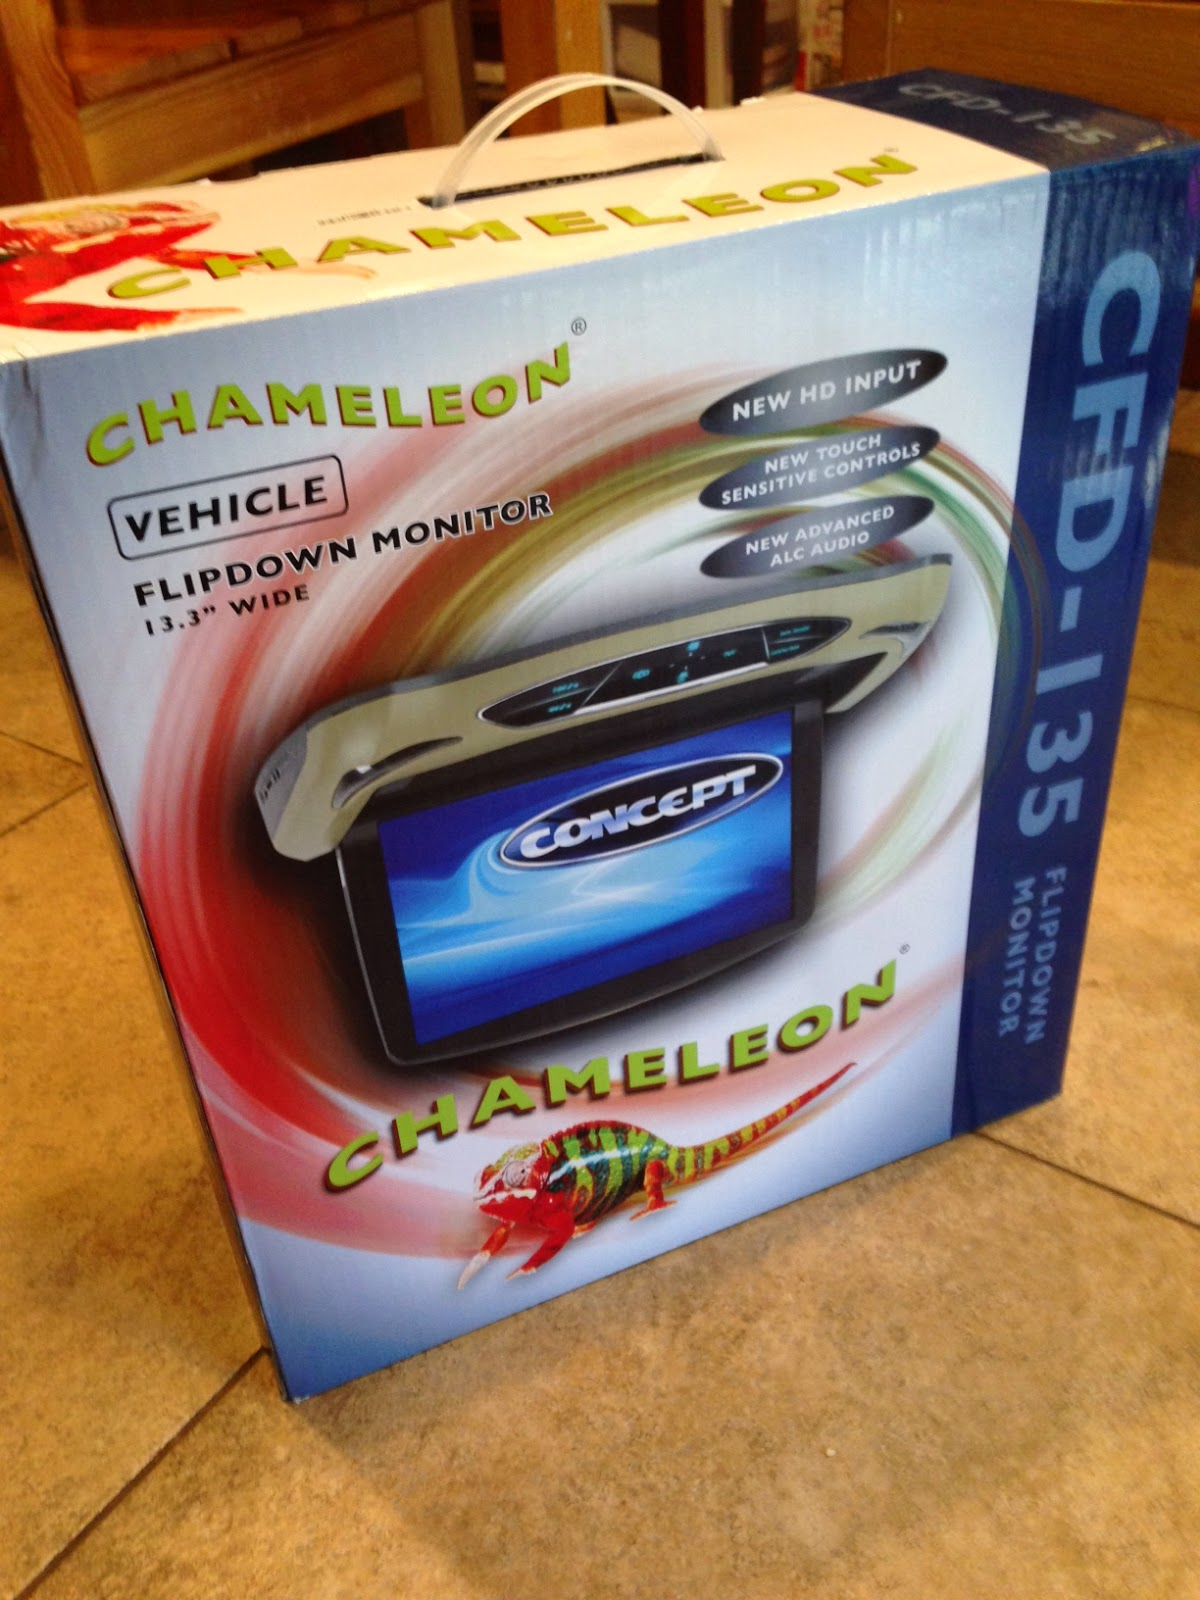 chameleon dvd player wiring diagram wiring library chameleon dvd player wiring diagram